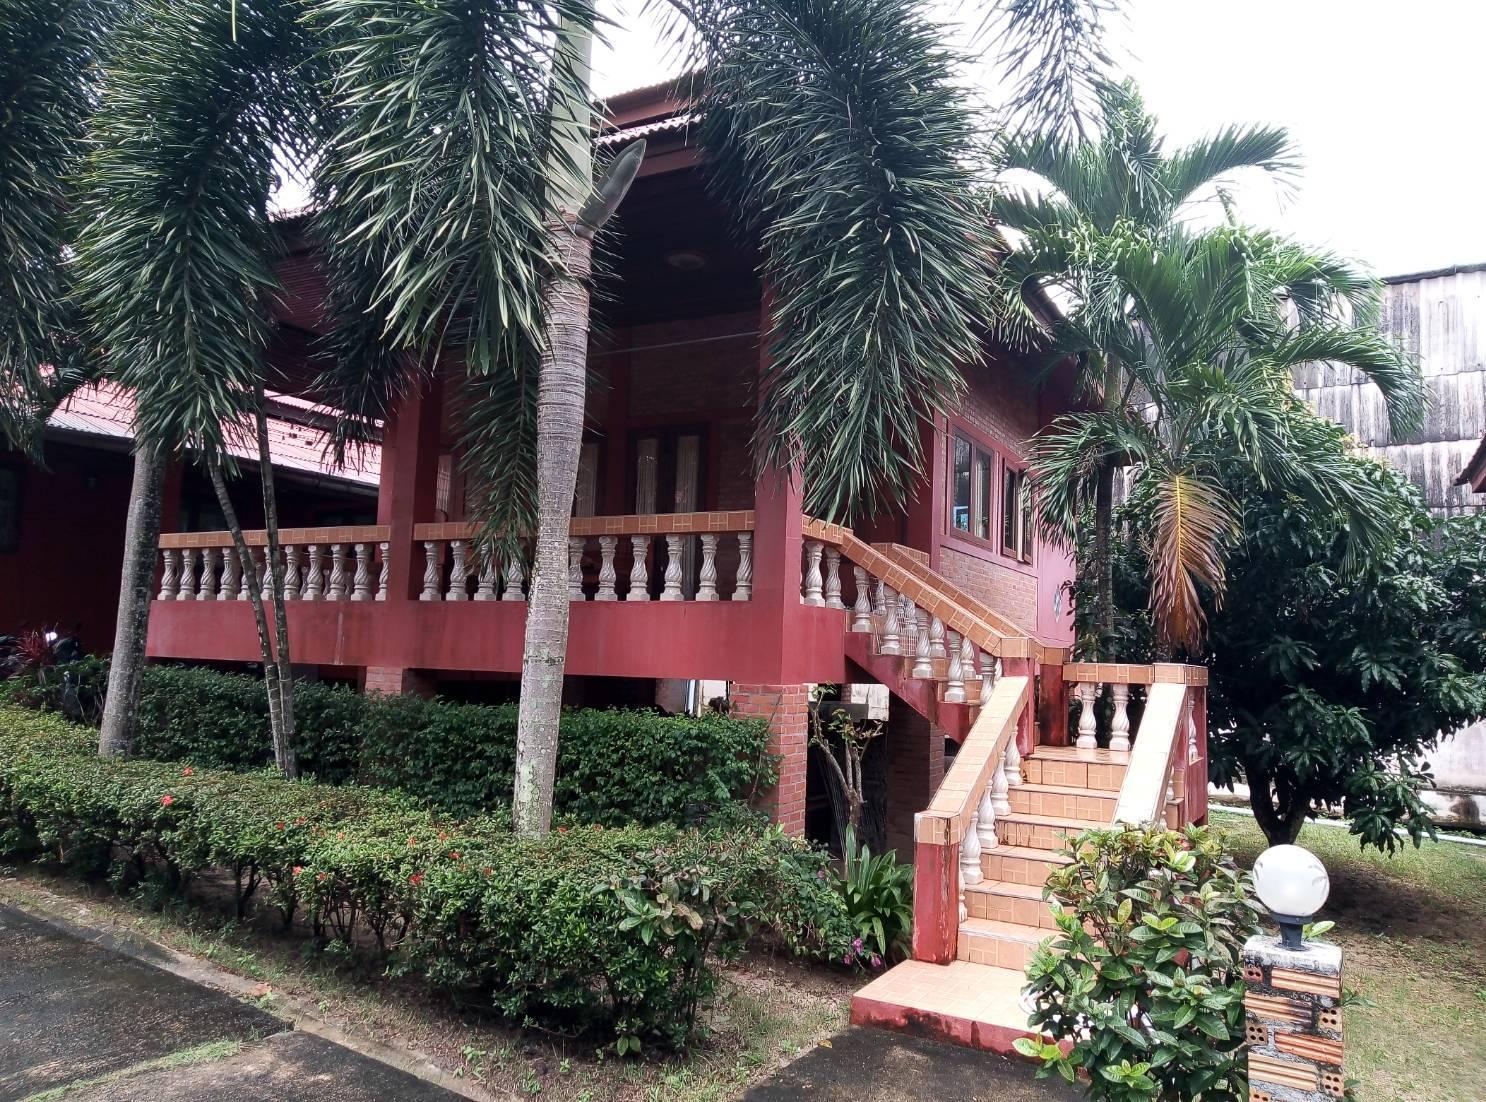 Comfy, Large House in Phangan for 2-3 people บ้านเดี่ยว 1 ห้องนอน 1 ห้องน้ำส่วนตัว ขนาด 60 ตร.ม. – วกตุ่ม